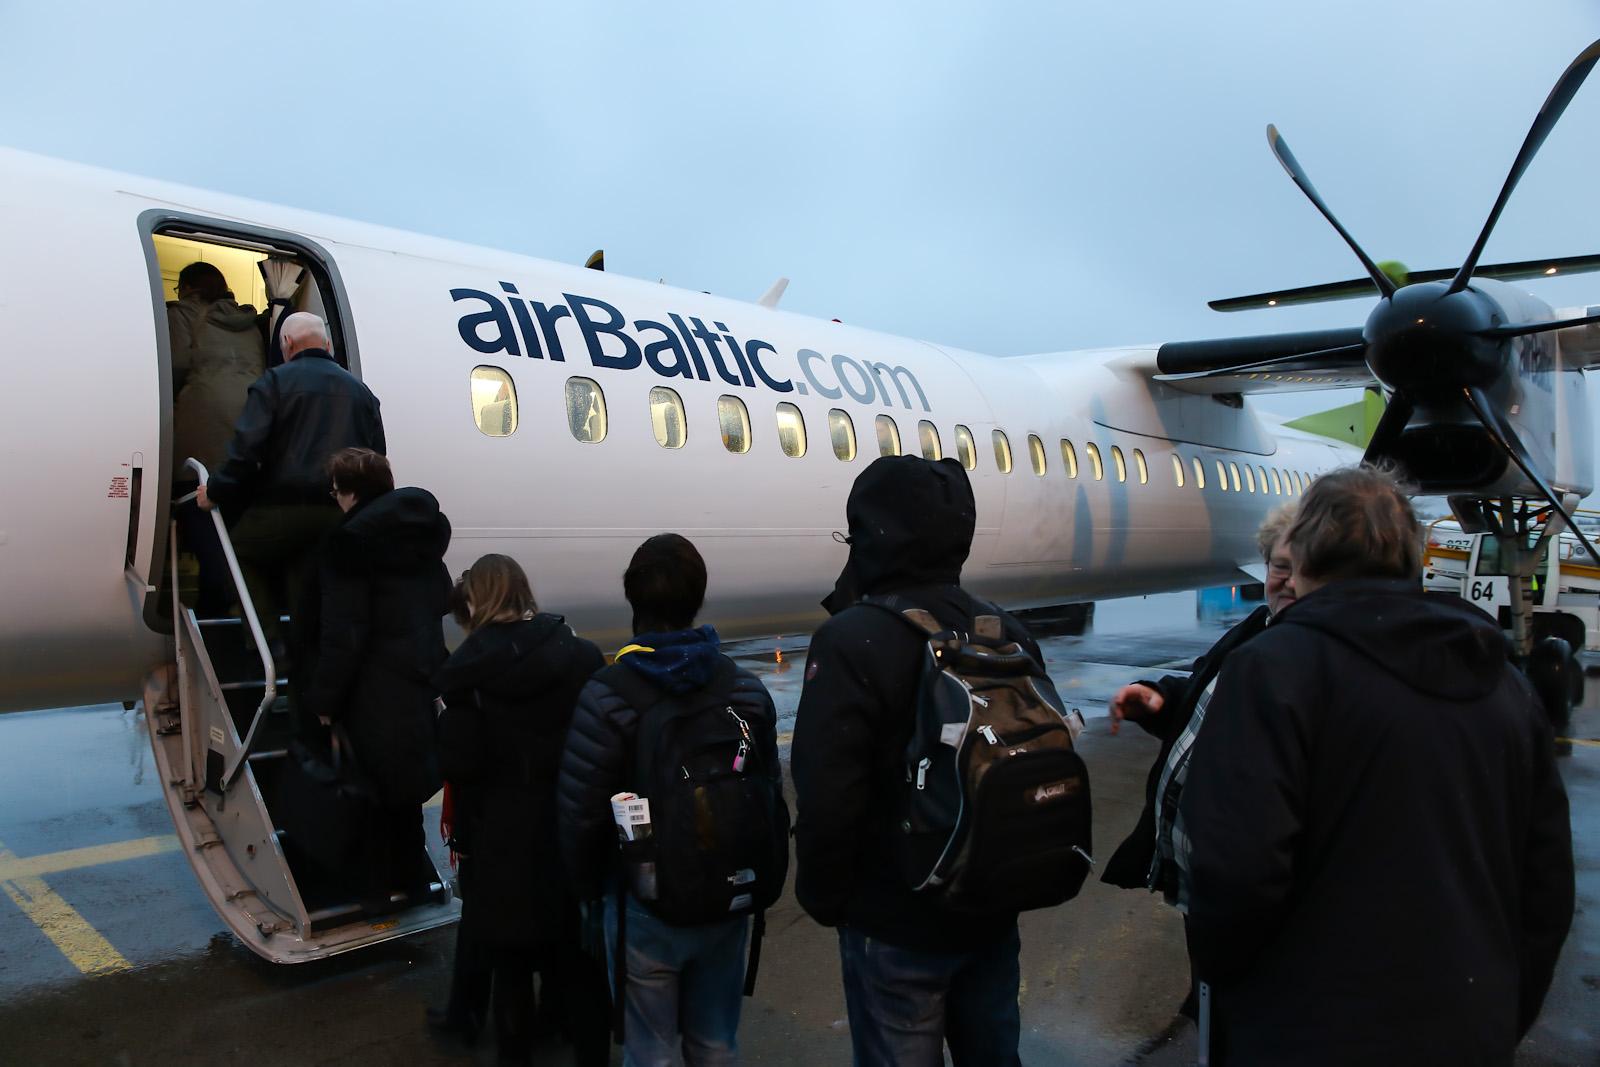 Bombardier Dash 8Q-400 авиакомпании airBaltic в аэропорту Хельсинки